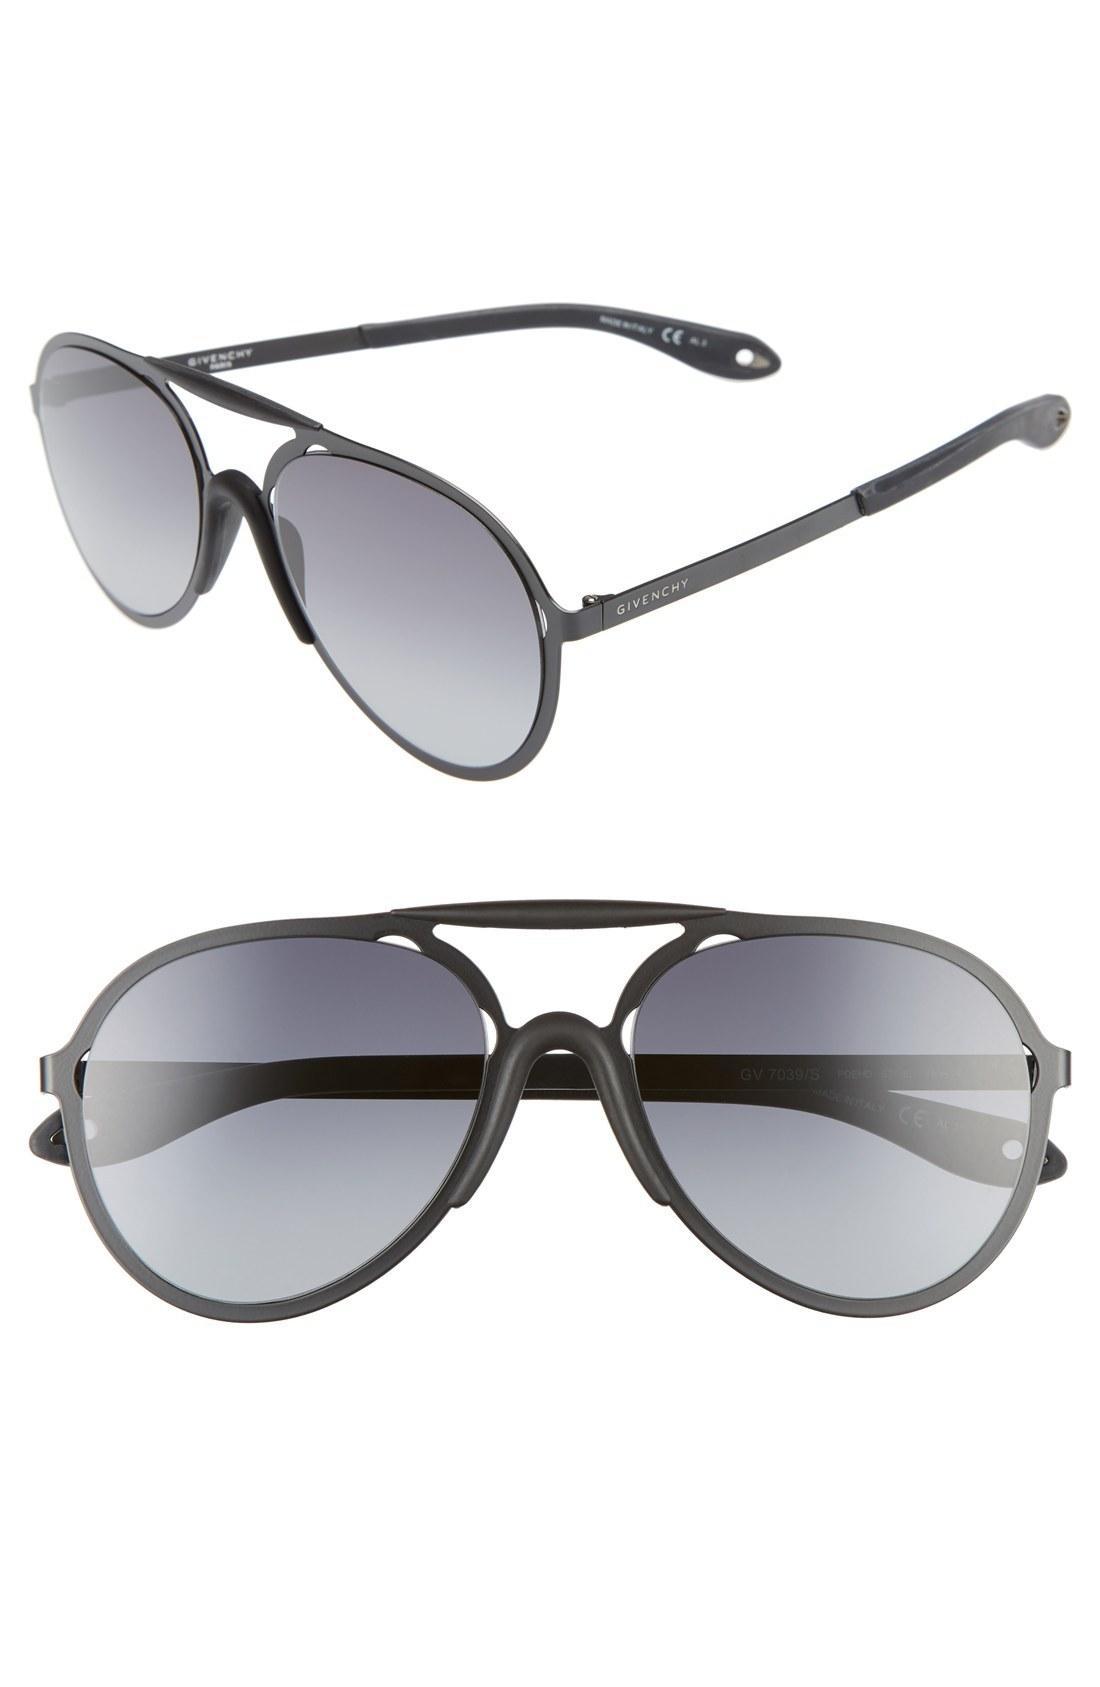 ef5347b1b1 Givenchy Gv7039 S Pde Hd Black Matte Aviator Sunglasses In Black  Grey  Gradient